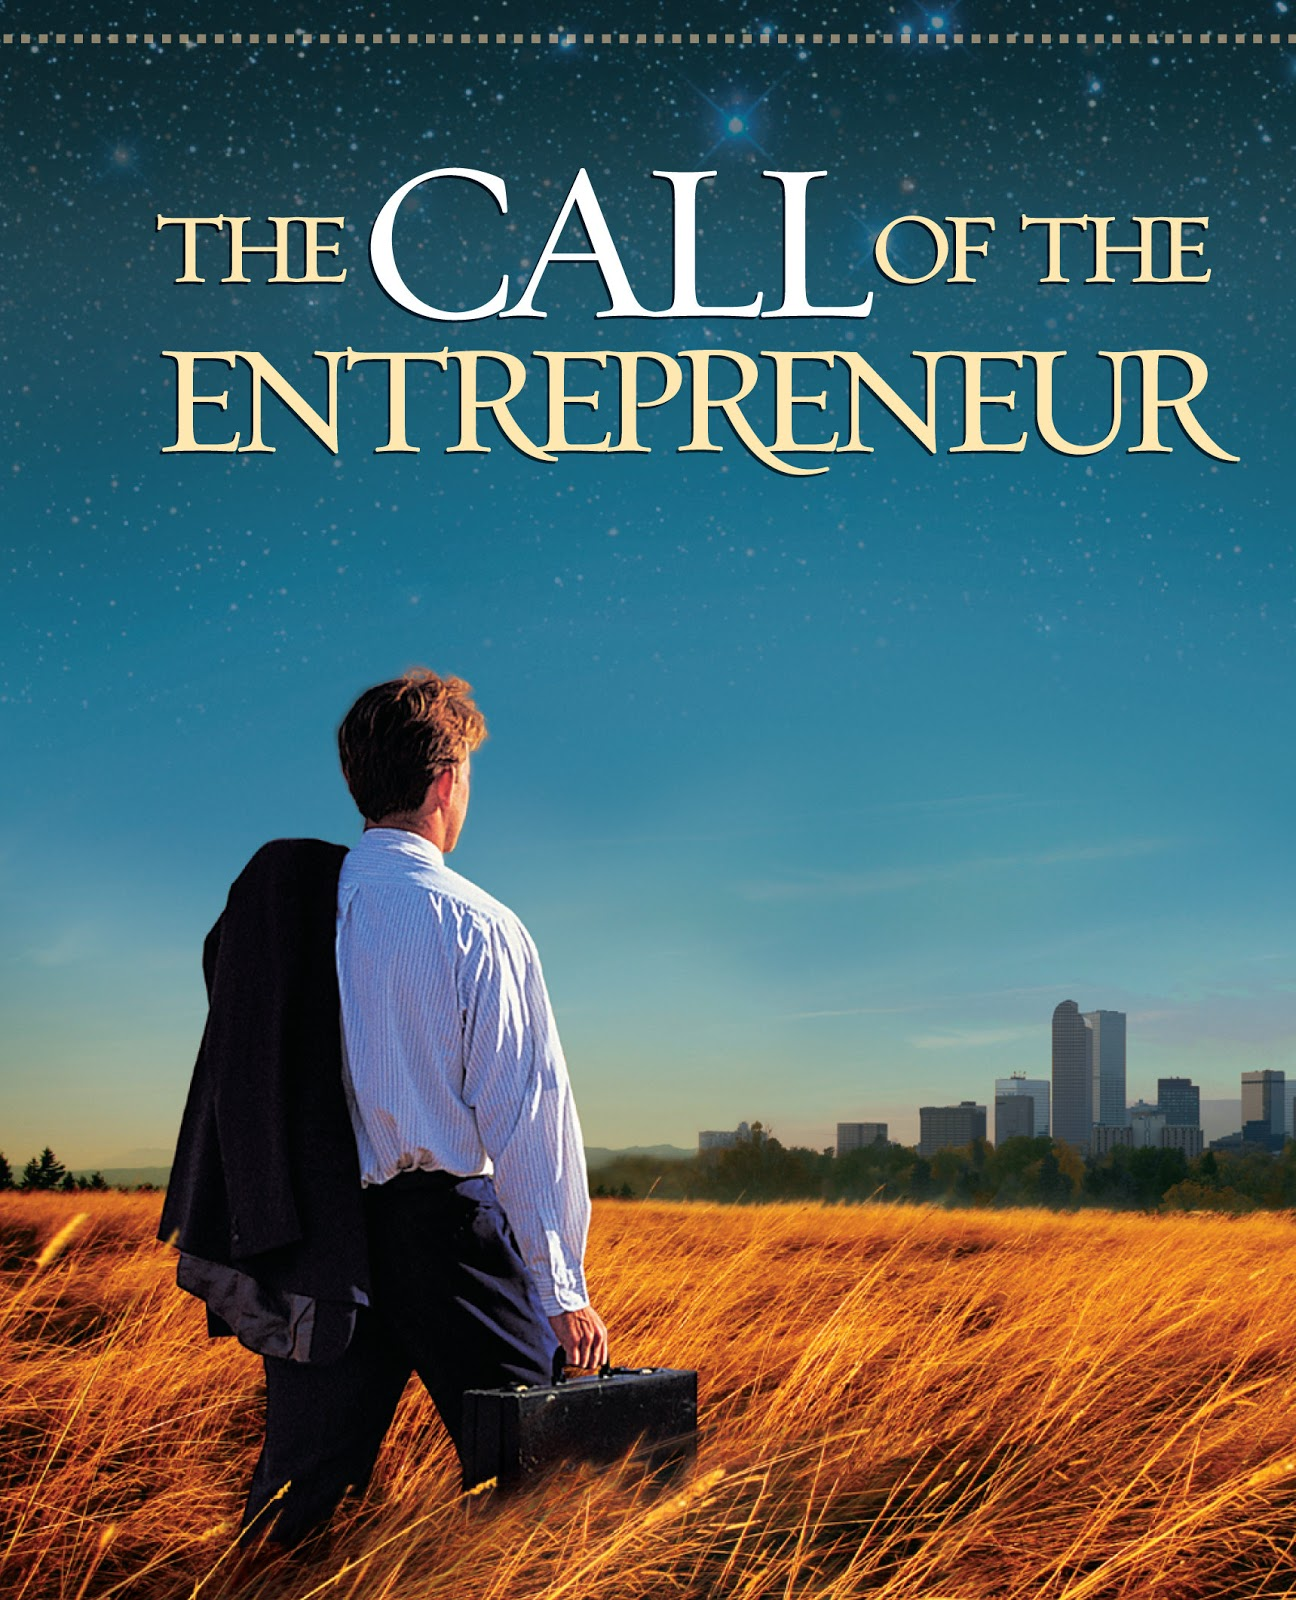 Best entrepreneur movies #42: The Call of the Entrepreneur